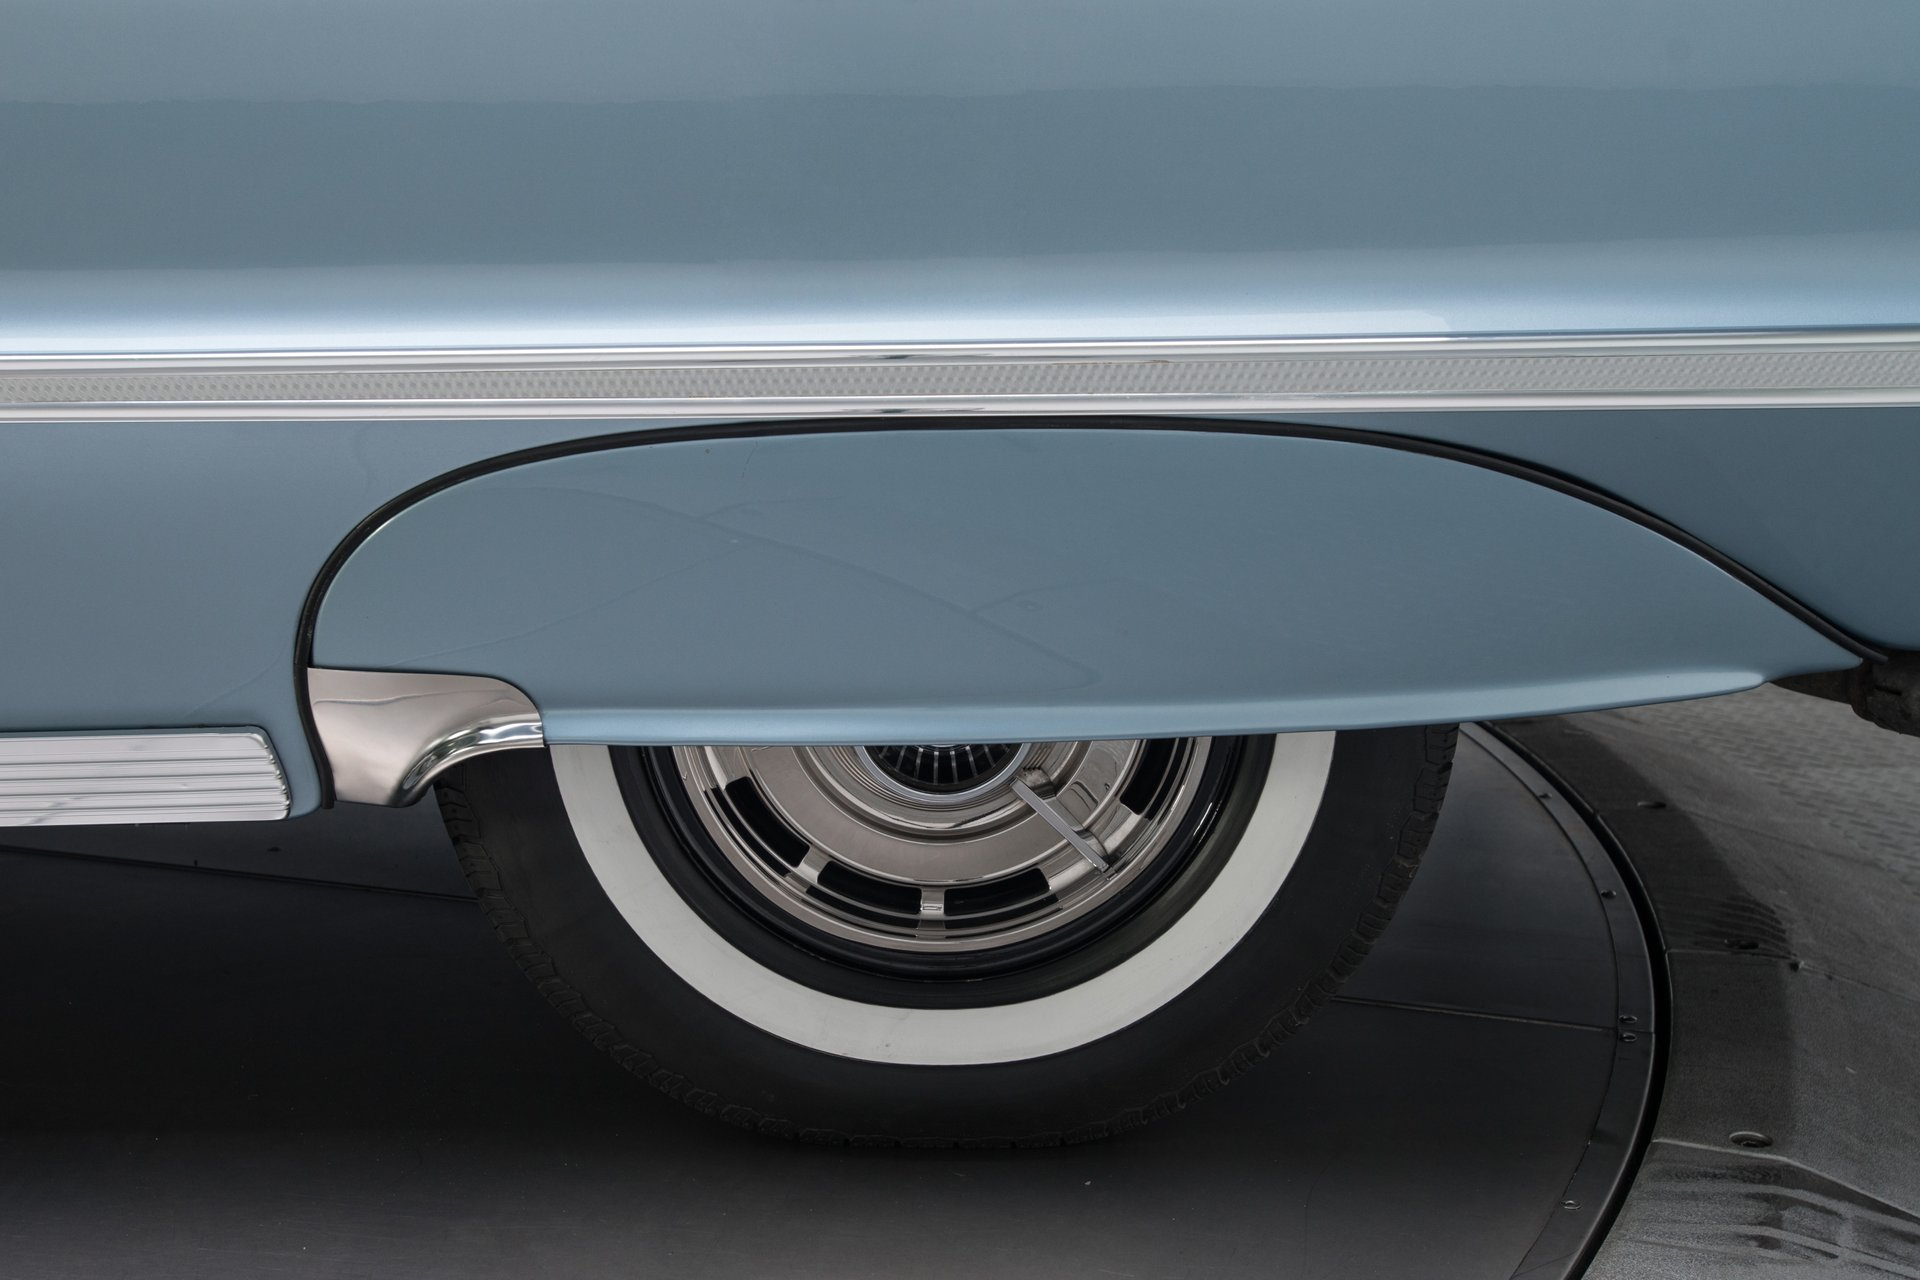 135129 1963 Chevrolet Impala RK Motors Classic Cars for Sale